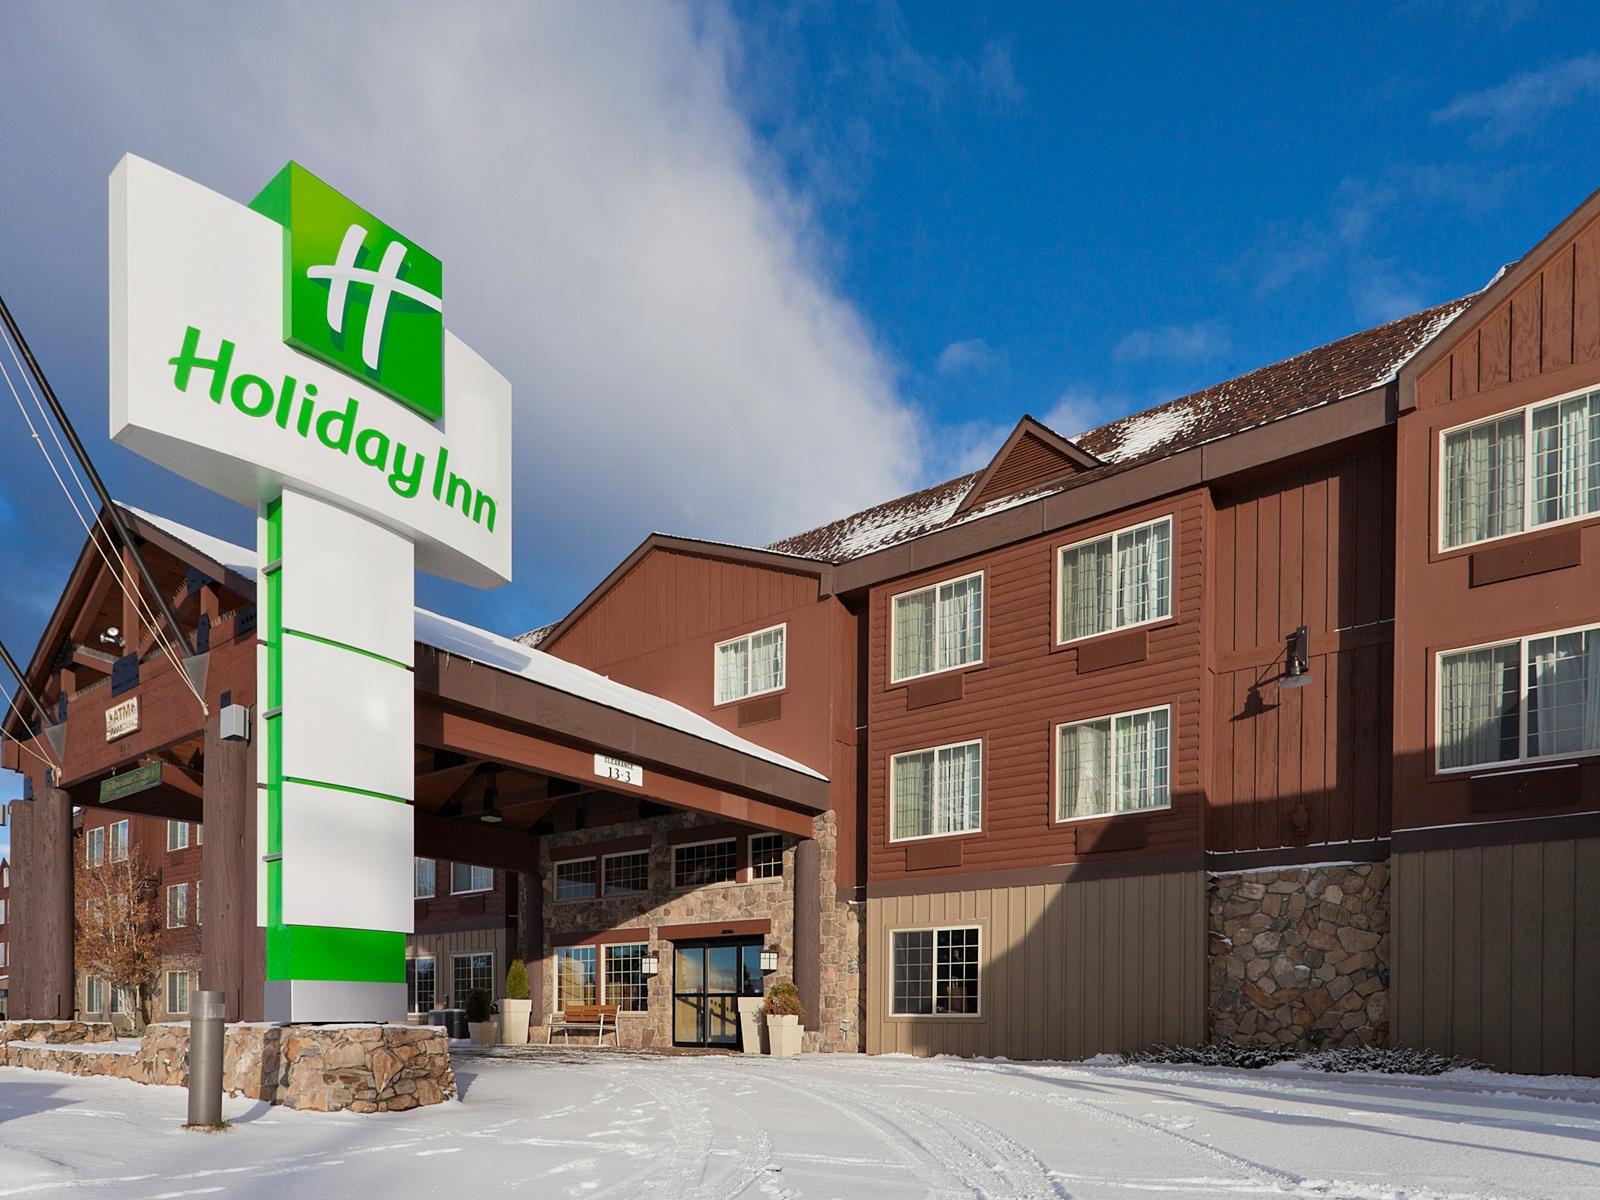 Holiday Inn West Yellowstone image